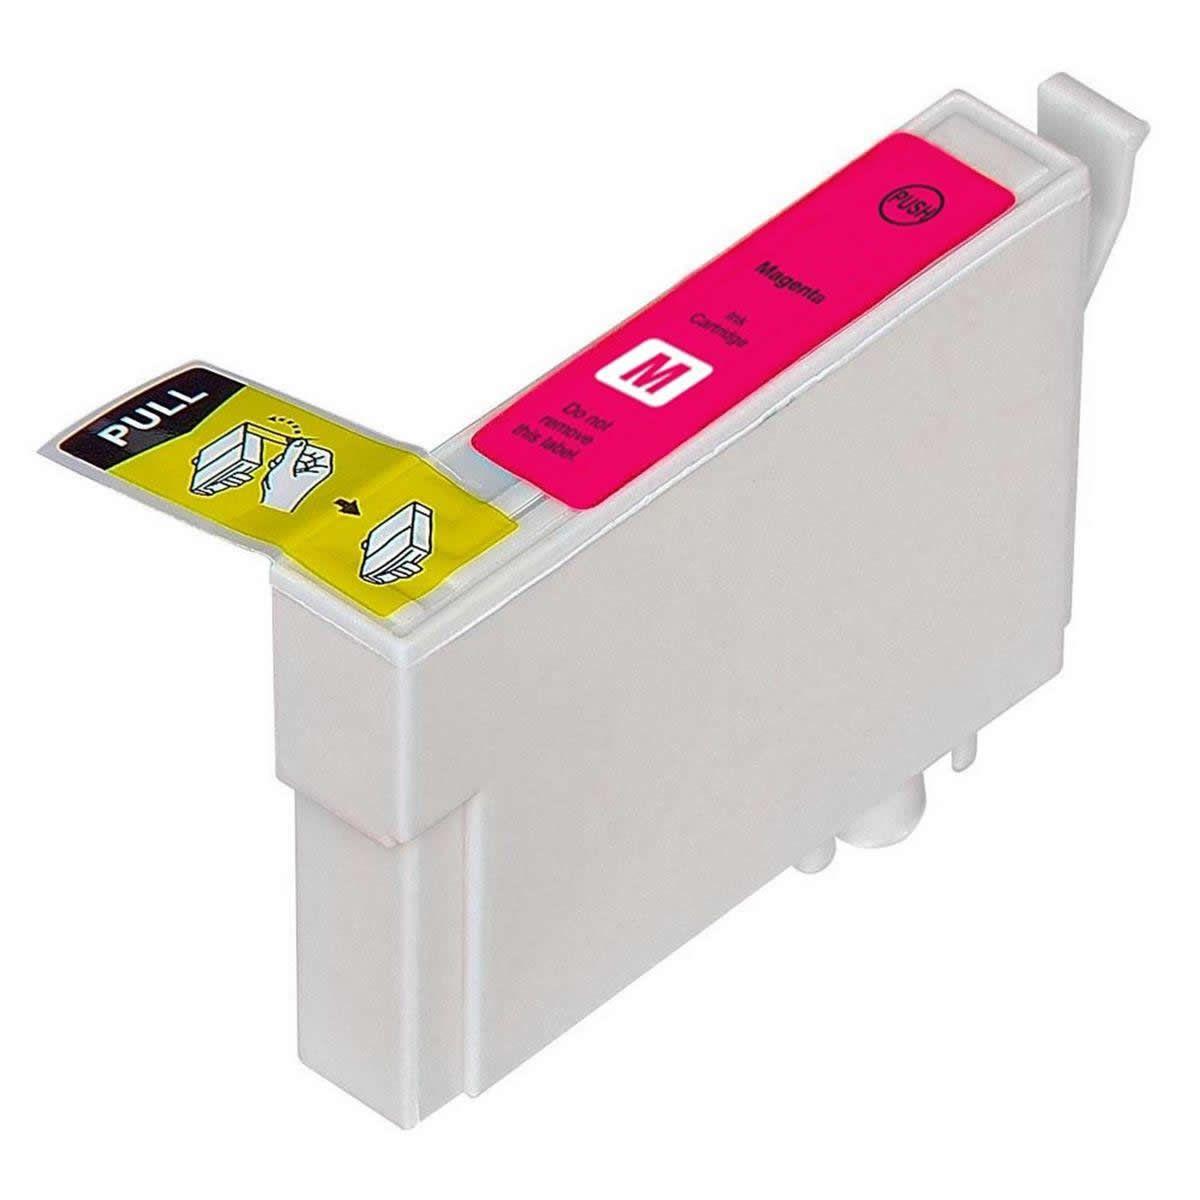 Cartucho TO633 Magenta Compatível para Epson C67 C87 CX3700 CX4100 CX4700 CX5700F CX7700